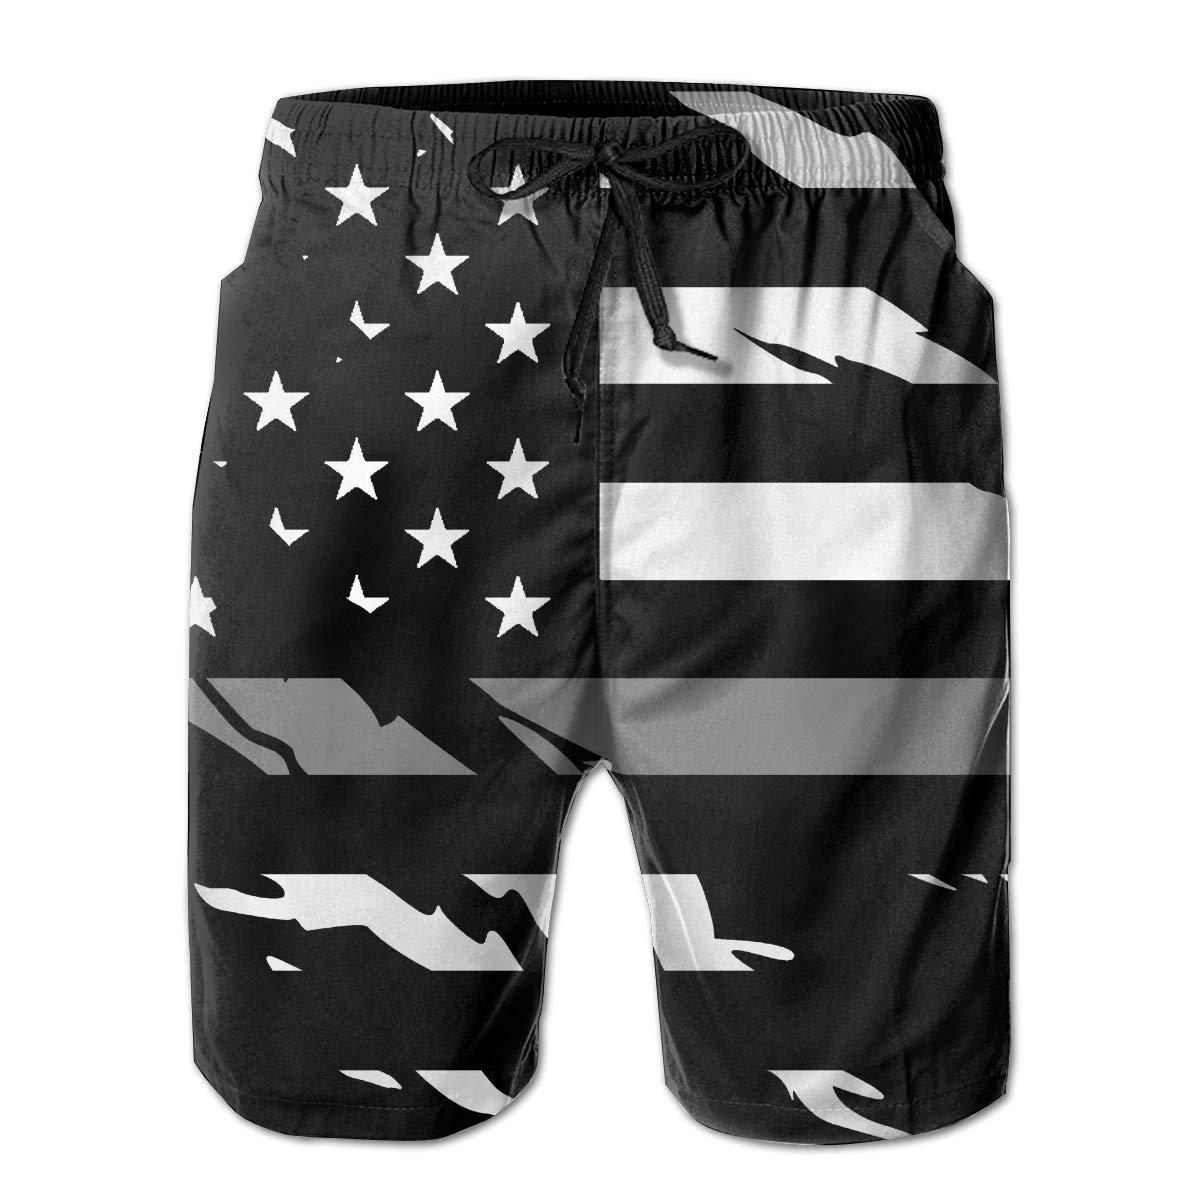 STLYESHORTS Ripped Thin Silver Line American Flag for Men Board Shorts Swim Trunks Beachwear Workout Beach Shorts